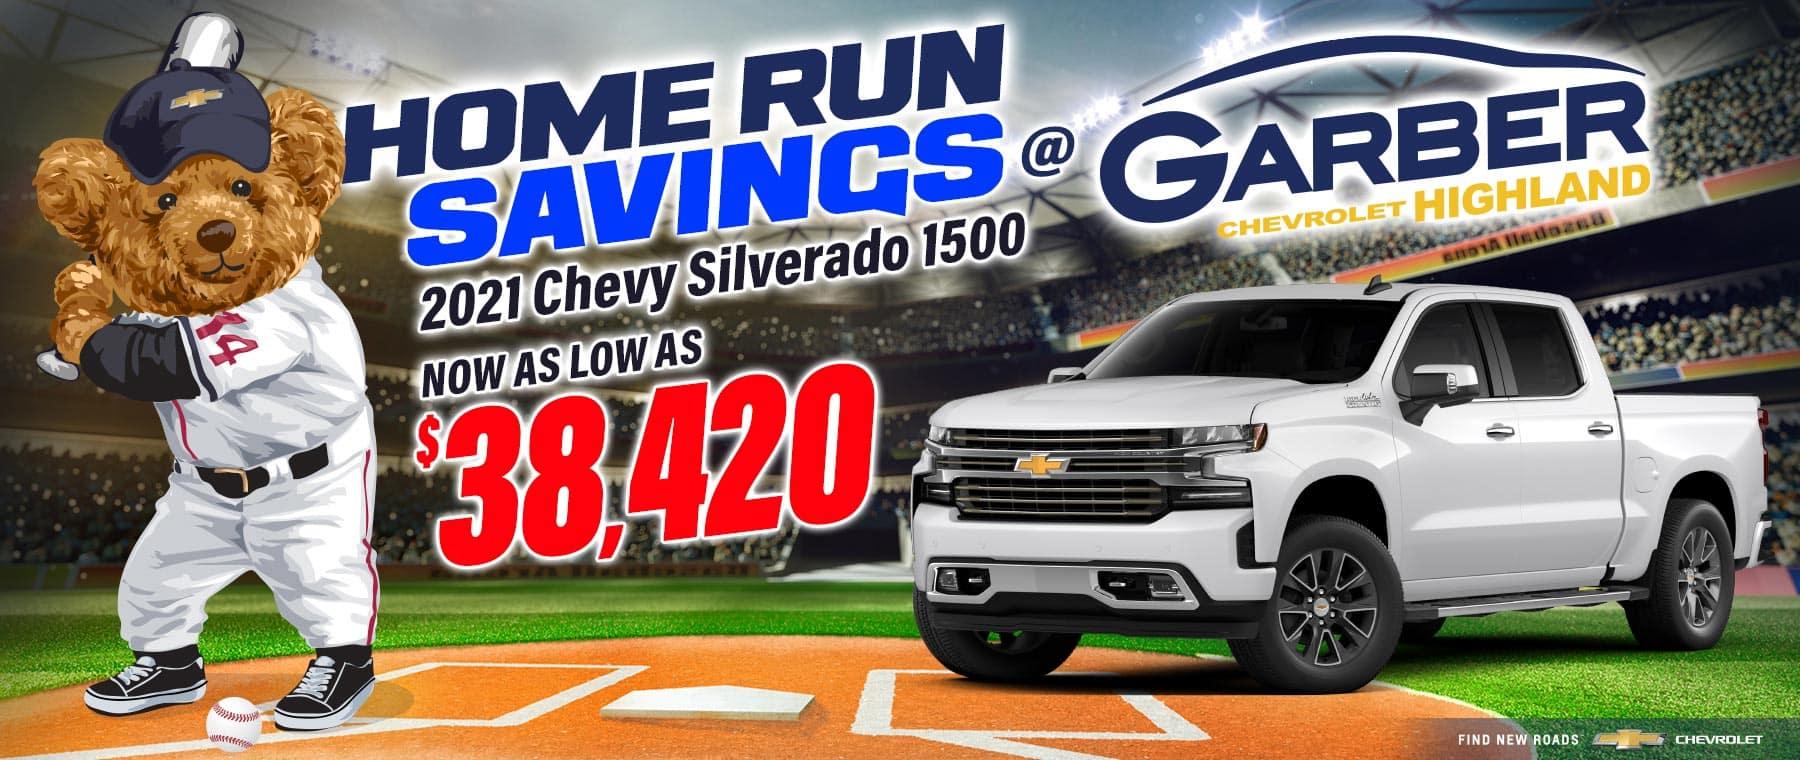 2021 Chevy Silverado - as low as $38,420